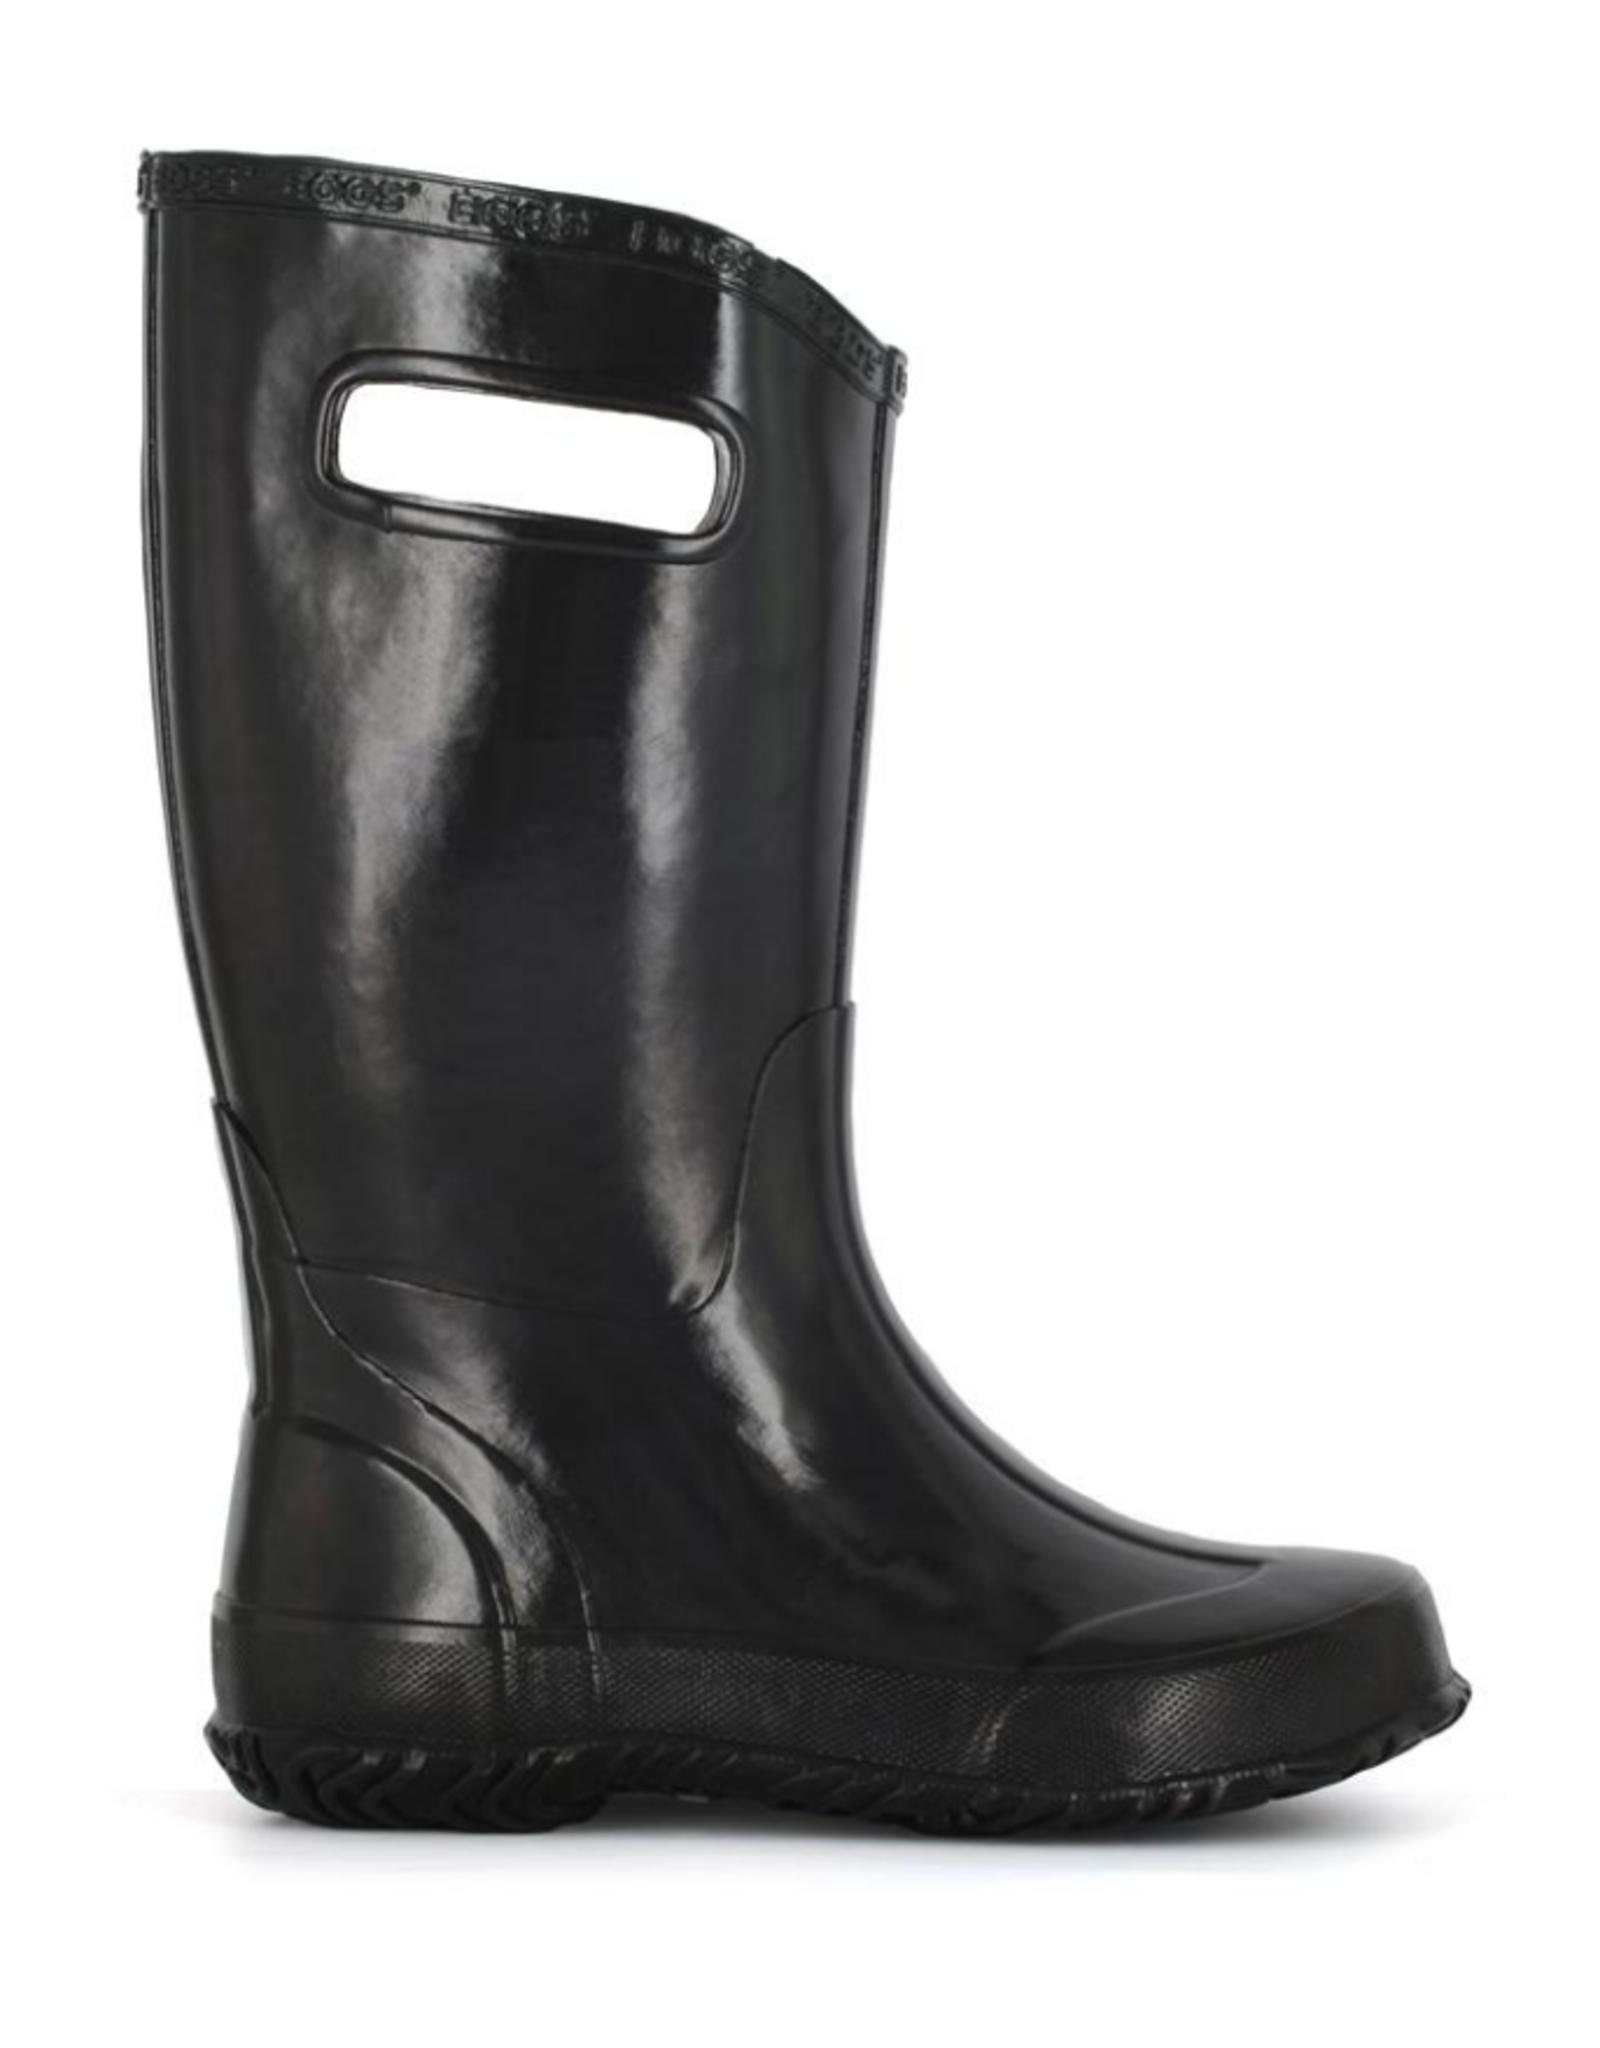 Bogs - Rainboot